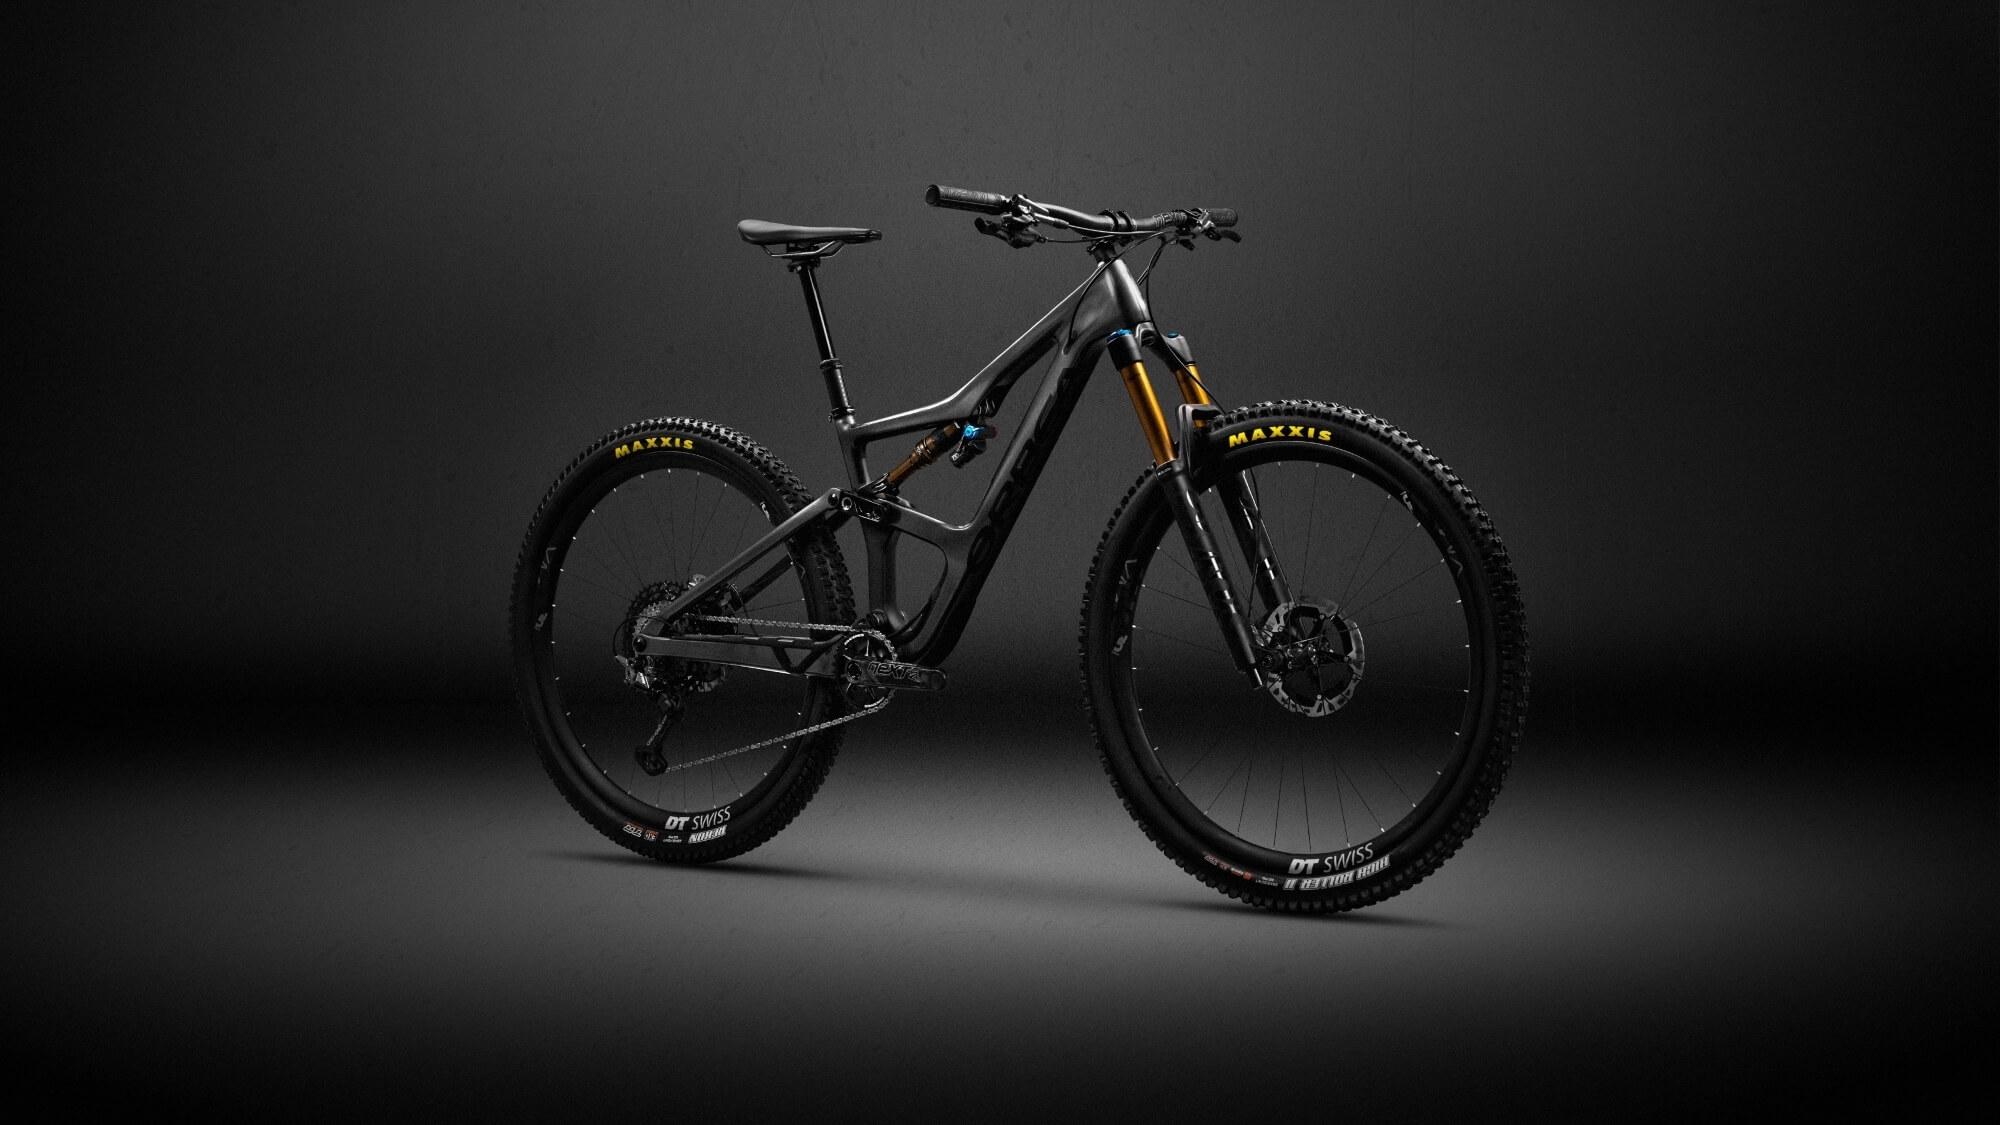 OCCAM_M-LTD-mtb-montana-bicicleta-montan